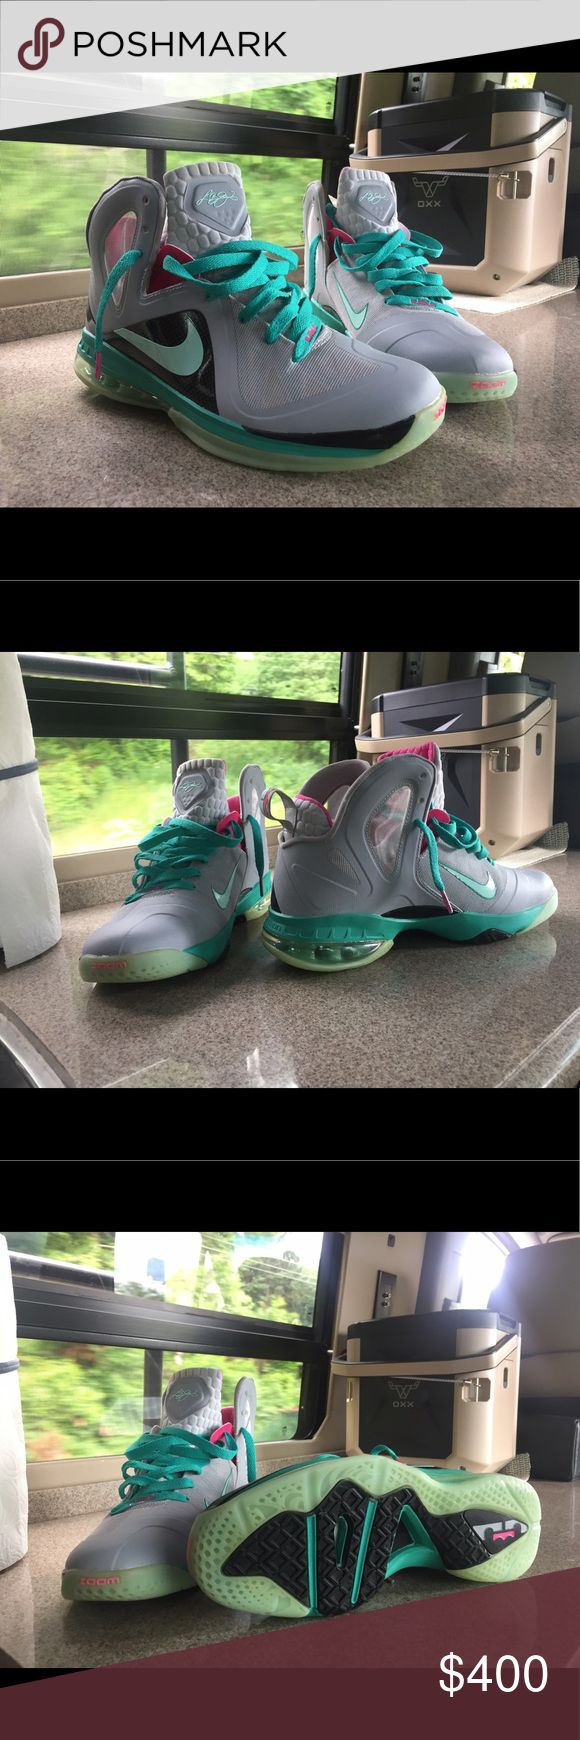 317aa71b0fbb4 Top Quality Nike Lebron 9 GS 472664 600 Black Laser Pink